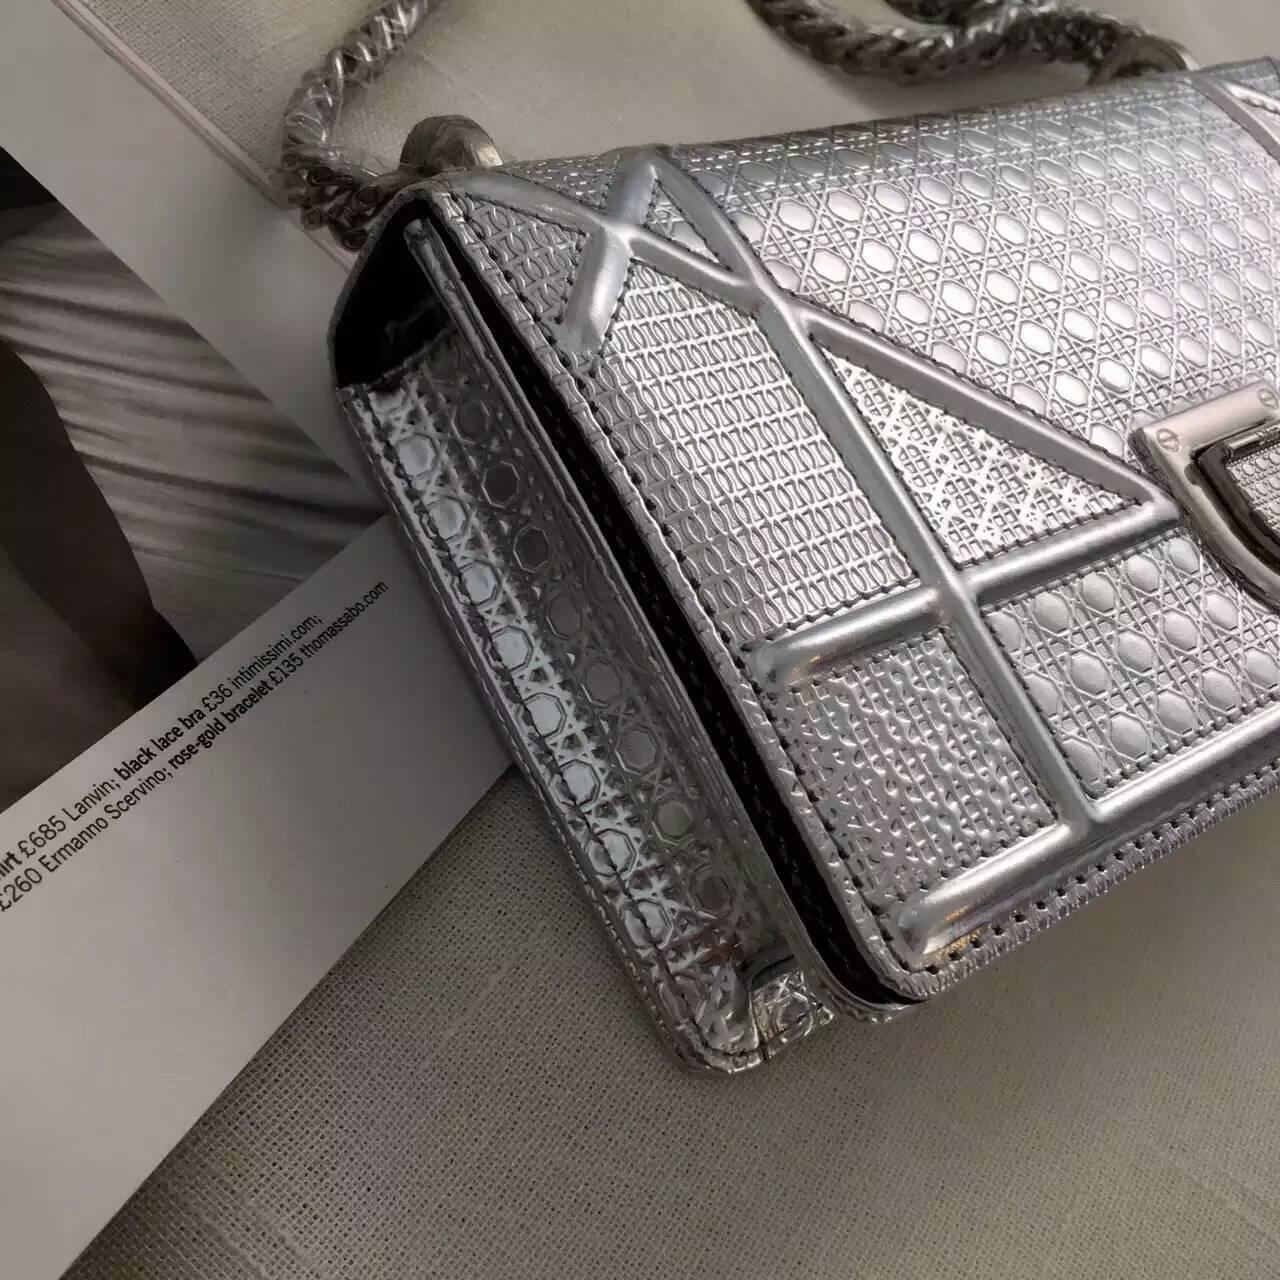 Dior迪奥新款包包 银色原版皮小香款链条斜挎包18cm